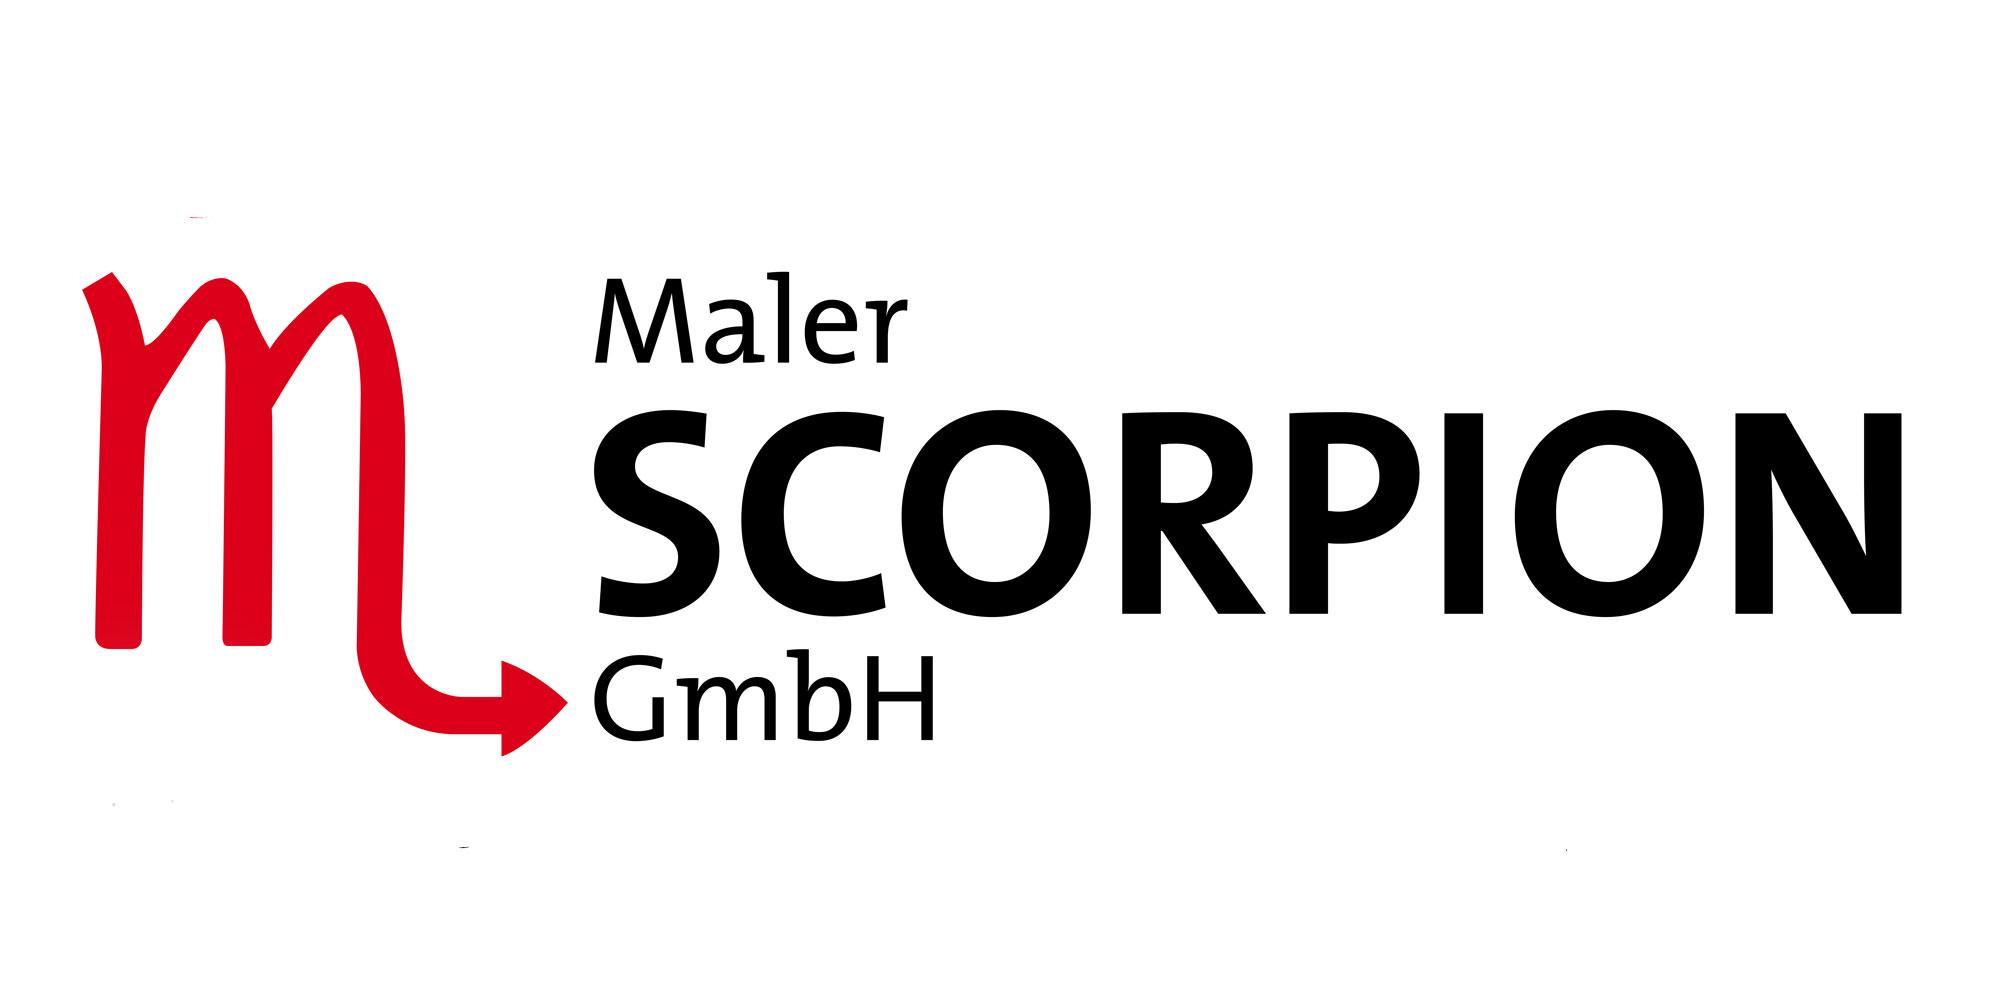 Maler Scorpion